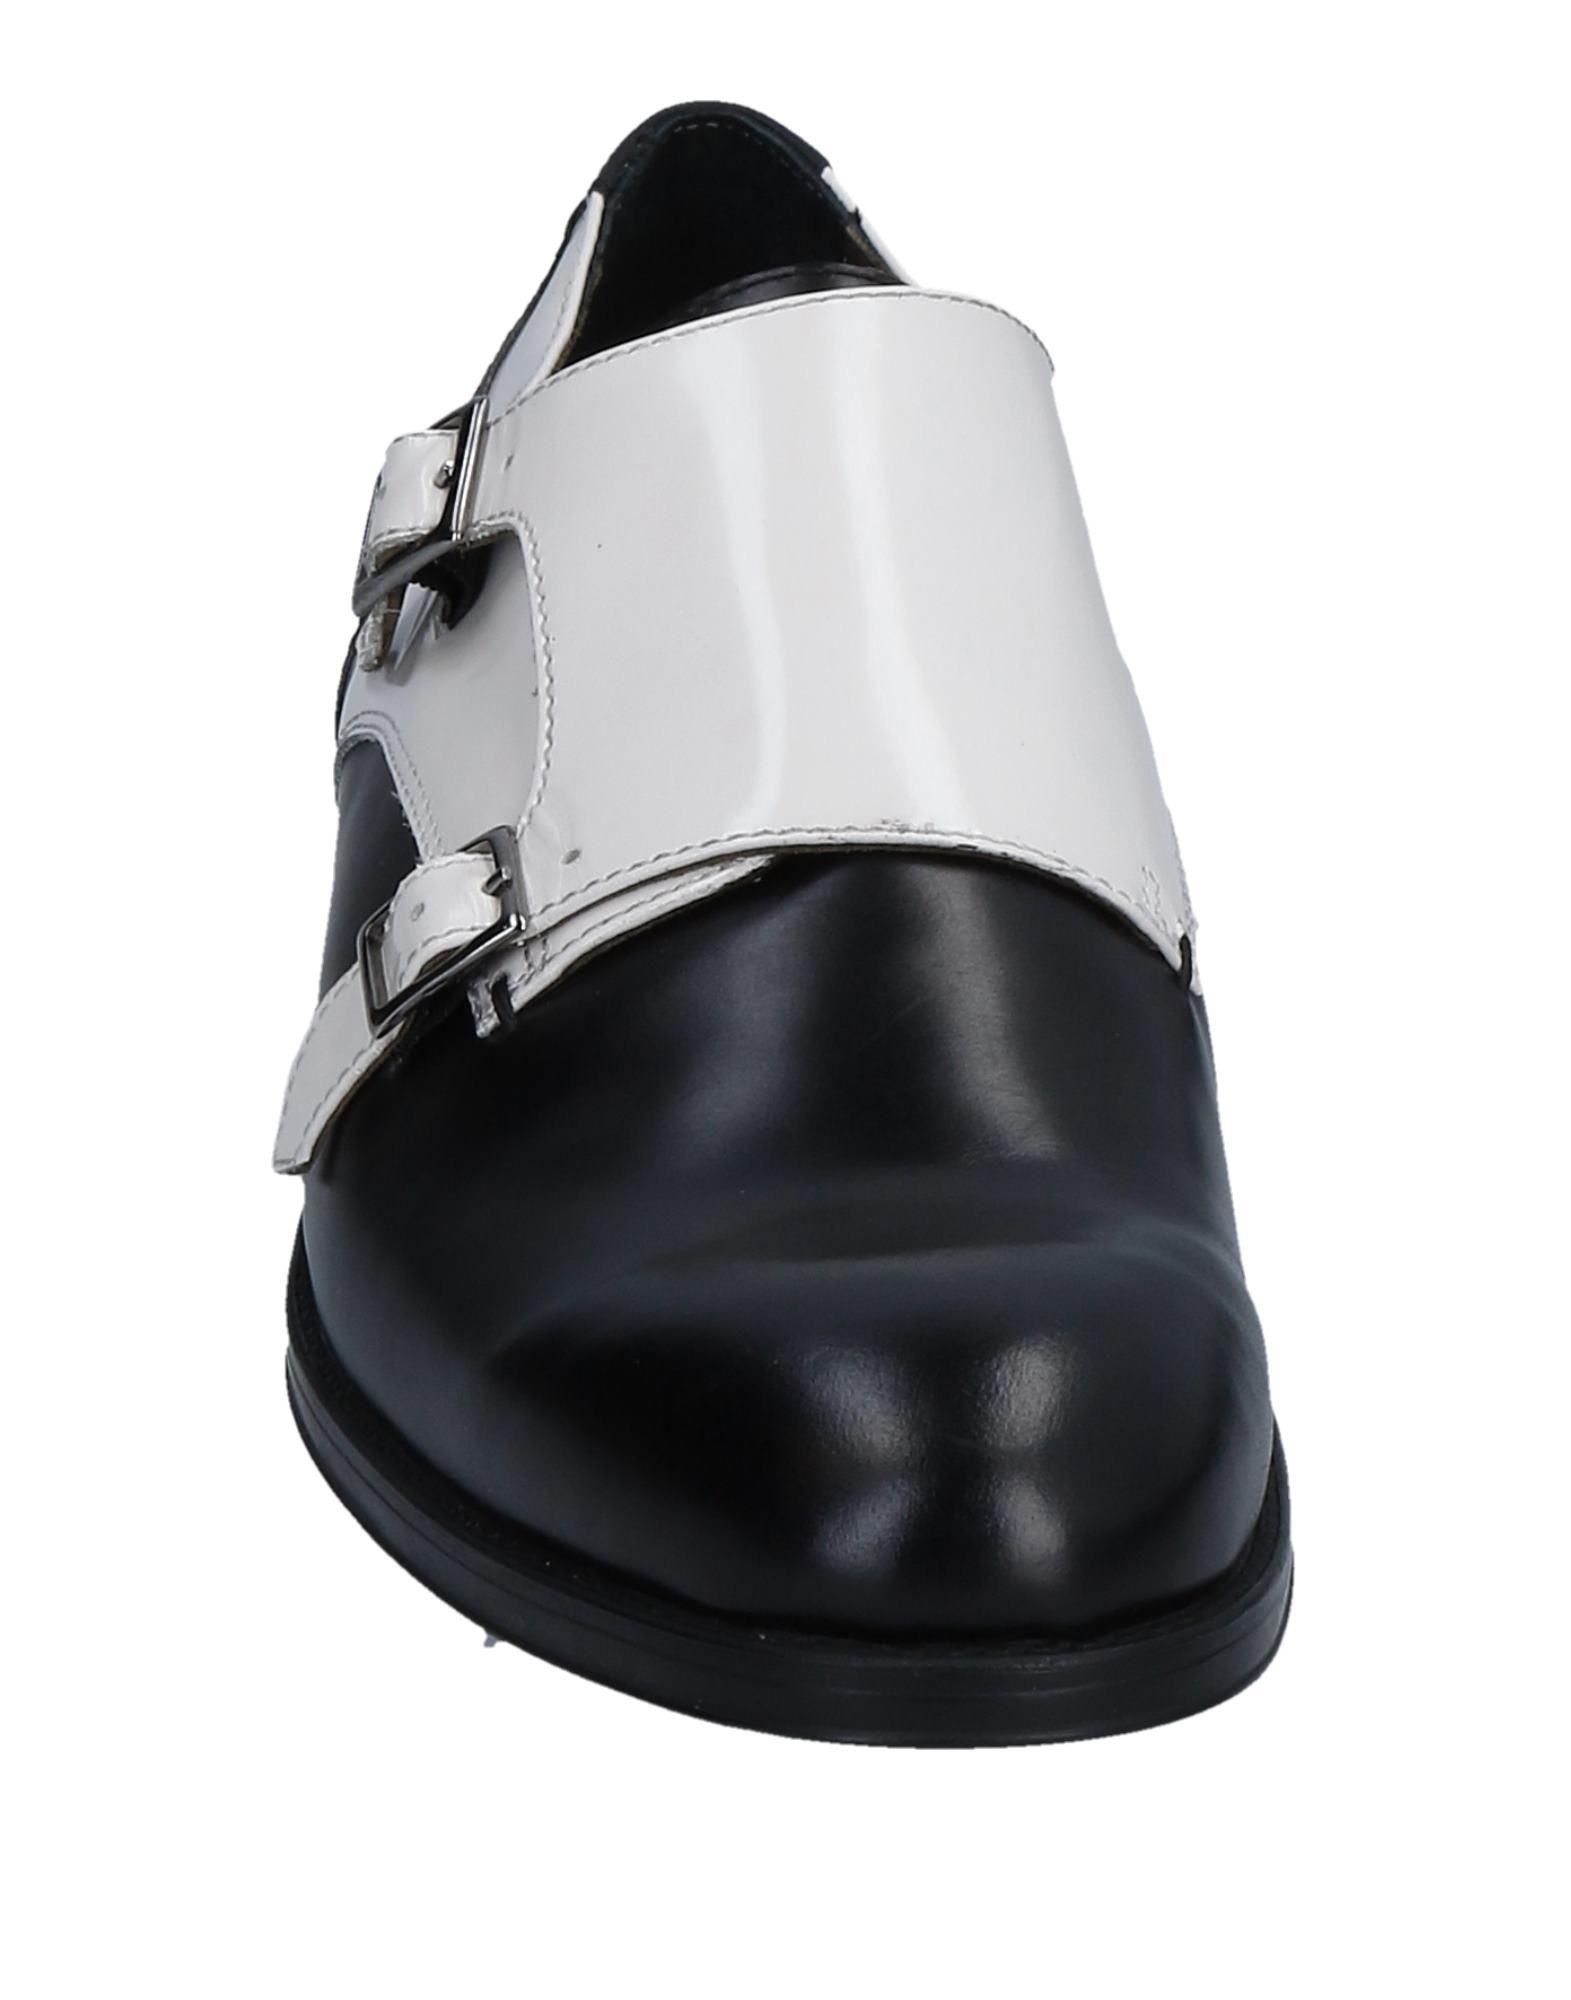 Wexford Mokassins Damen Qualität  11508016II Gute Qualität Damen beliebte Schuhe 595263